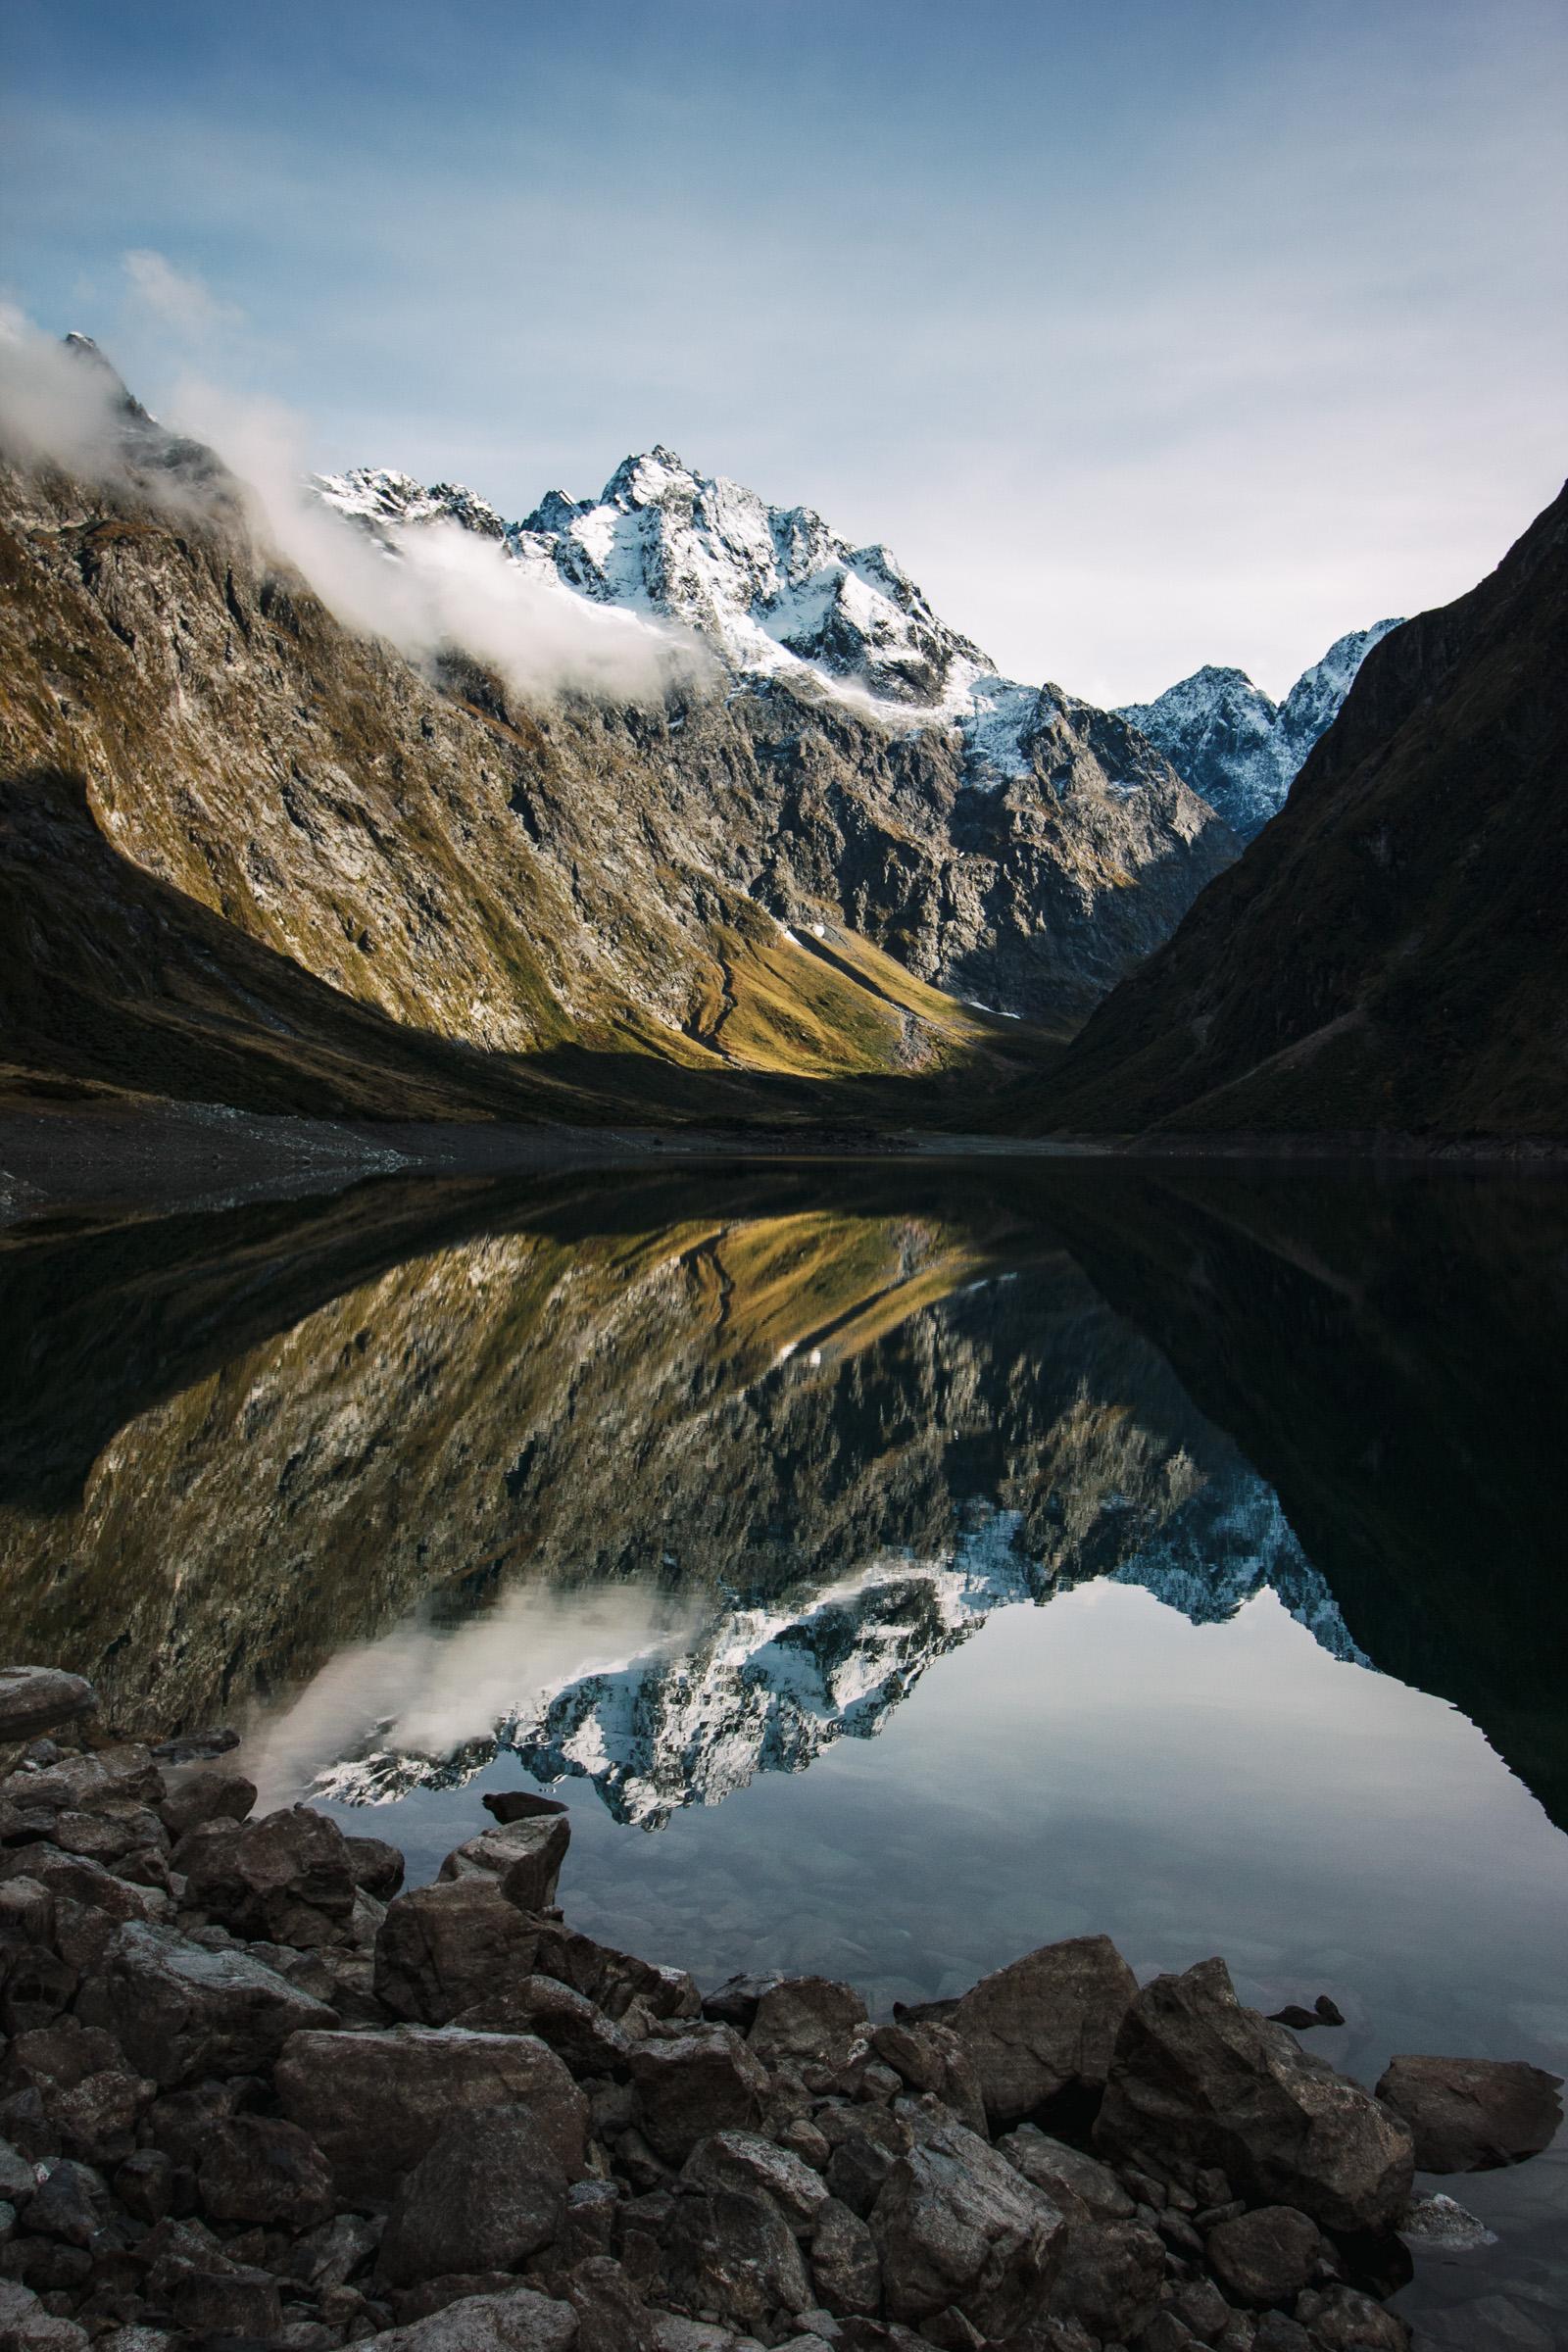 lake-marian-and-crosscut-mountain_34610811425_o.jpg